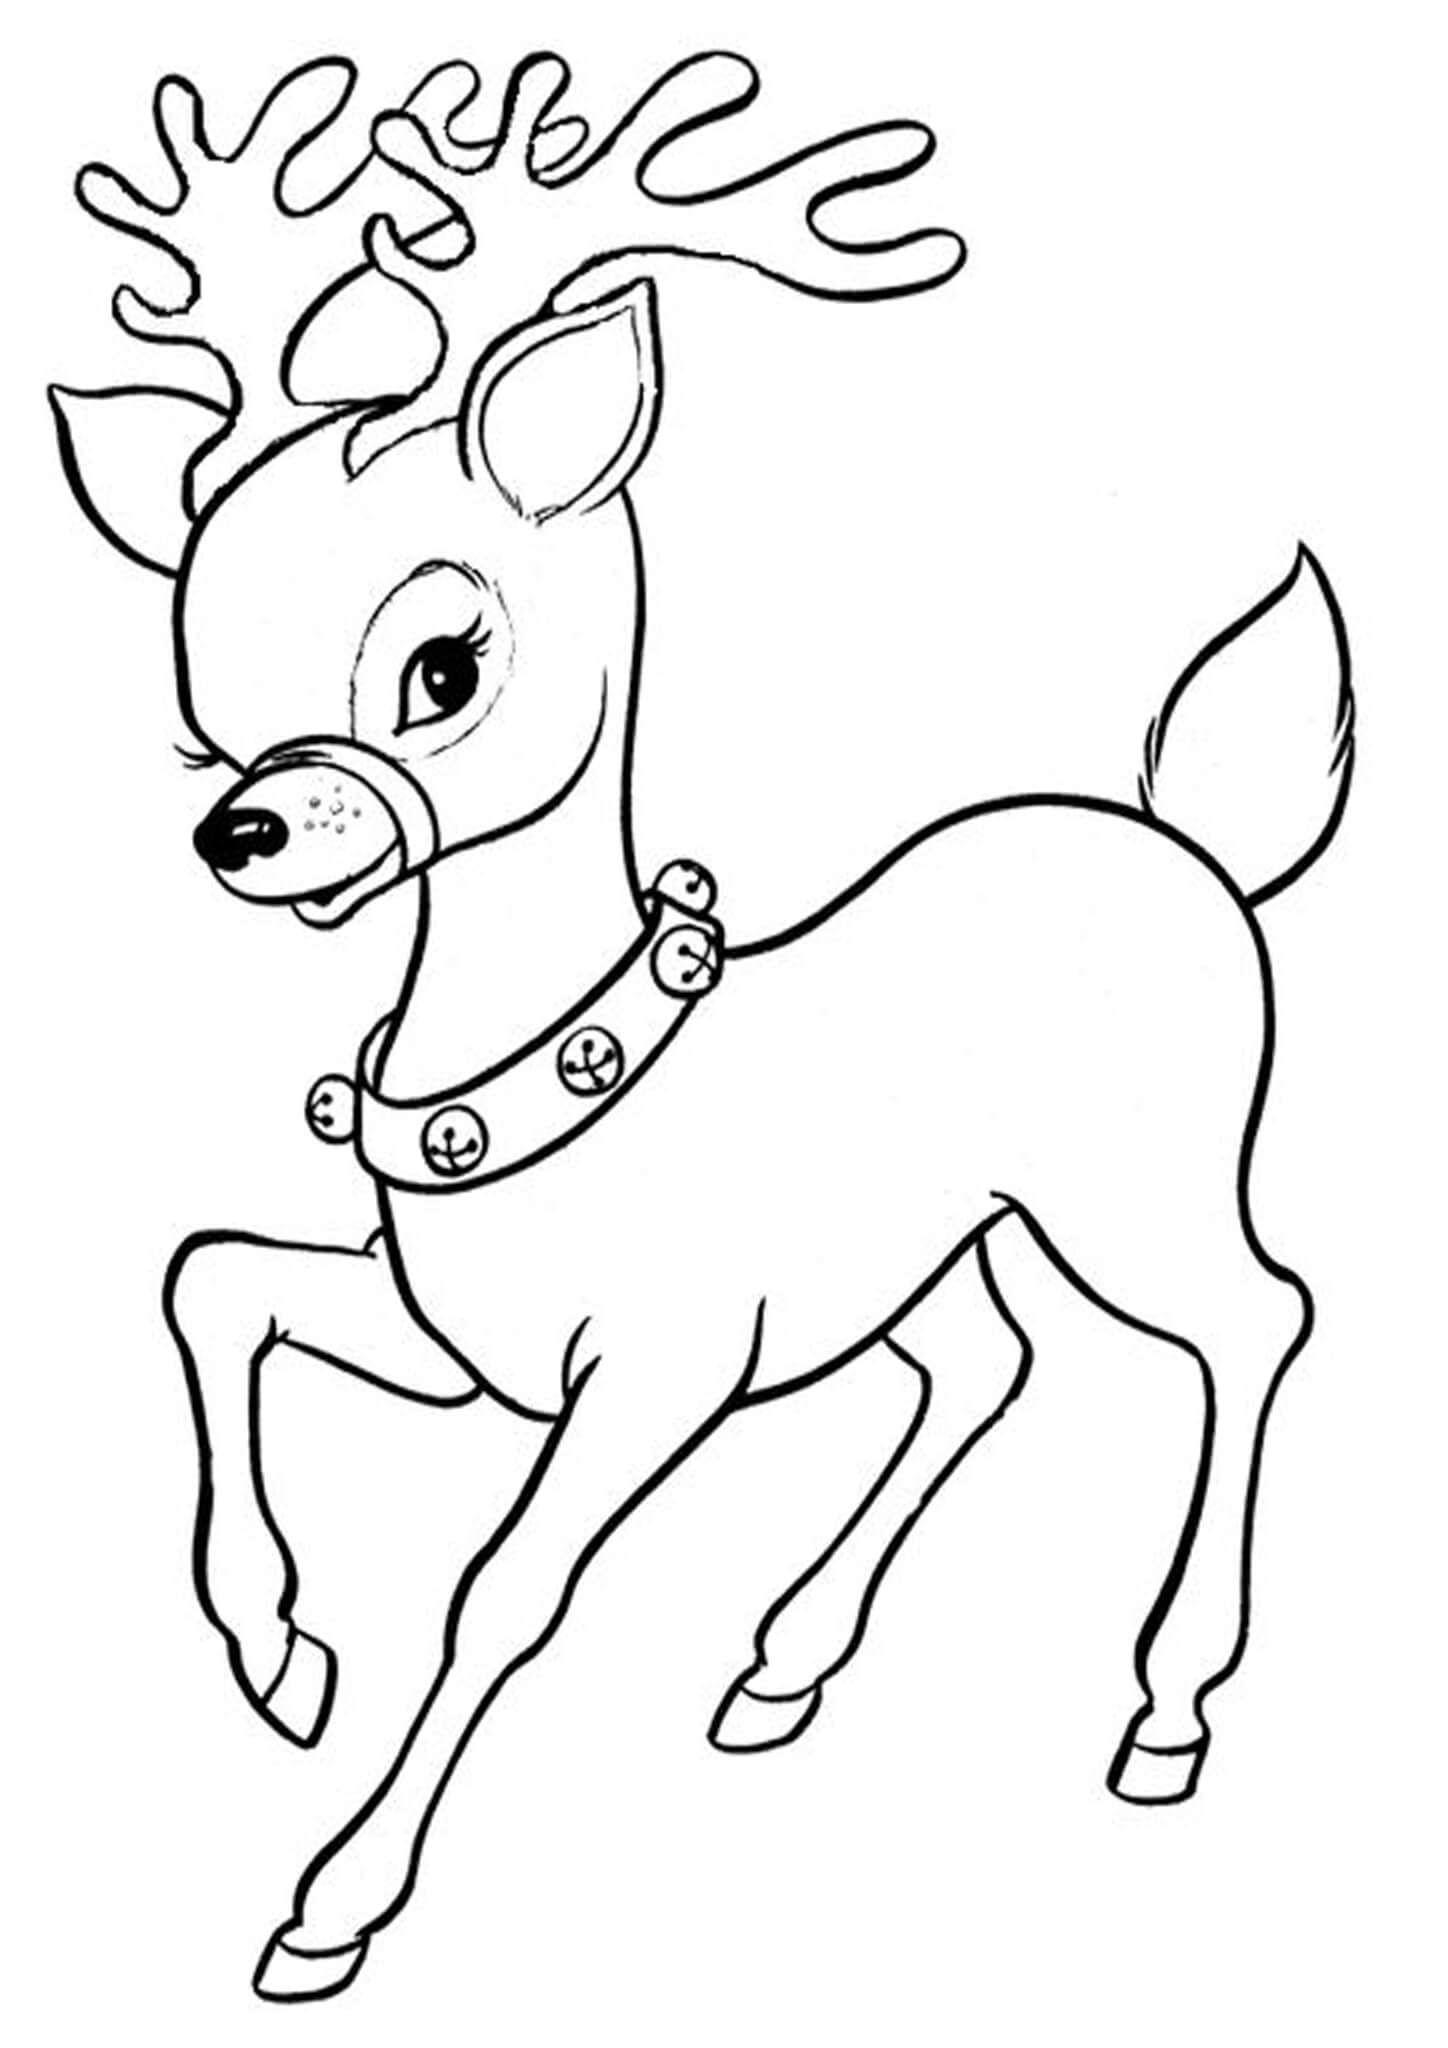 Free Printable Reindeer Coloring Pages Santa Coloring Pages Christmas Coloring Sheets Christmas Coloring Pages